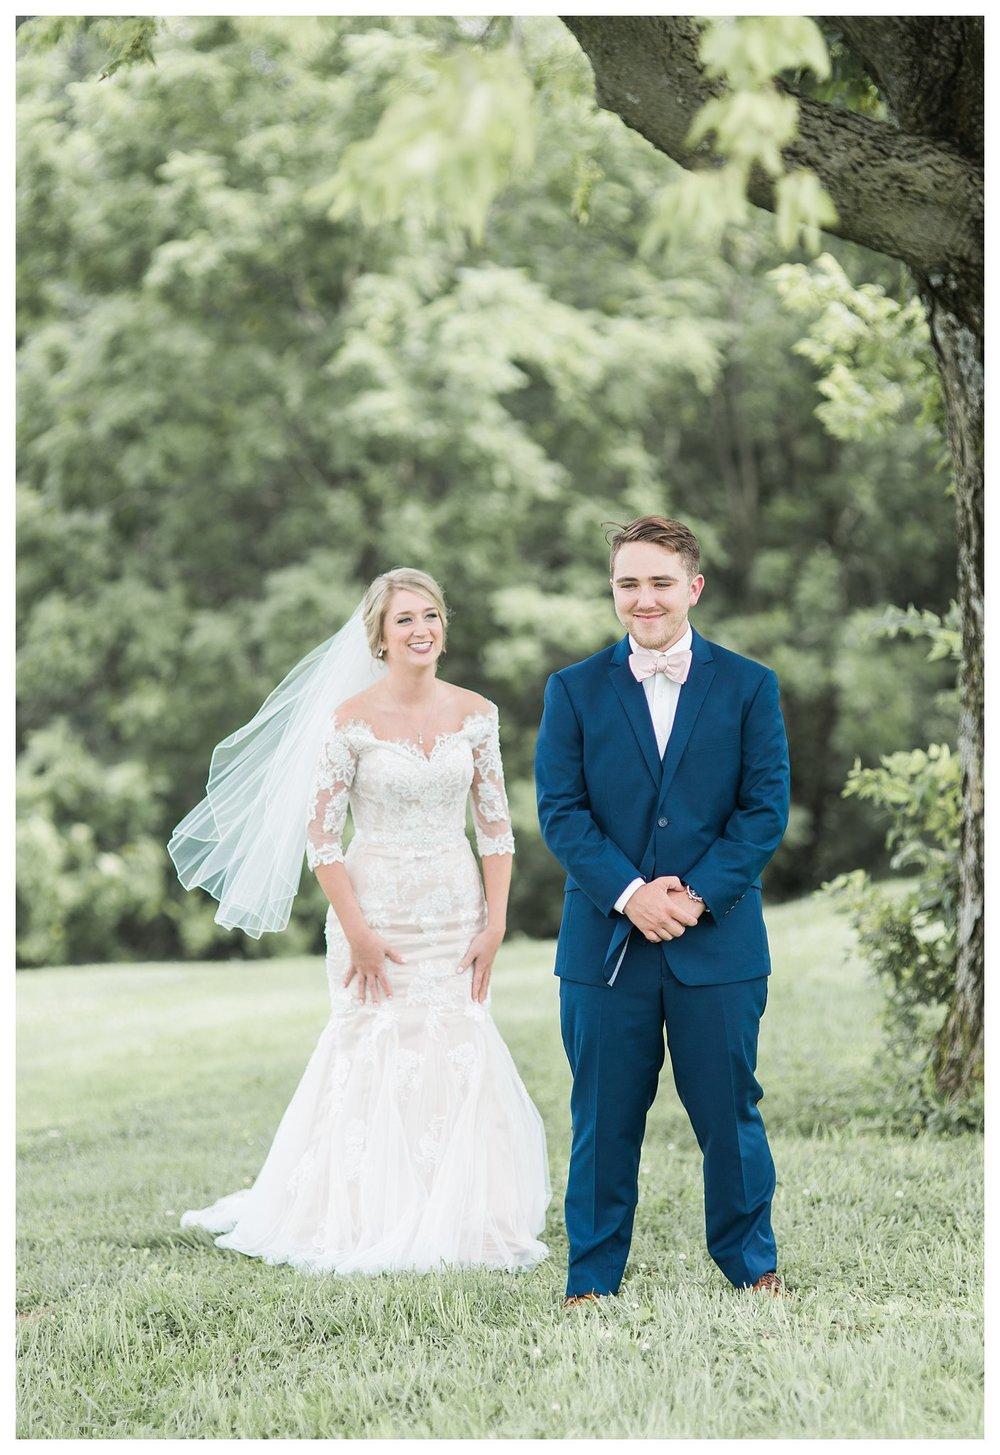 tower-park-mess-hall-everleigh-photography-northern-kentucky-wedding-photographer-15